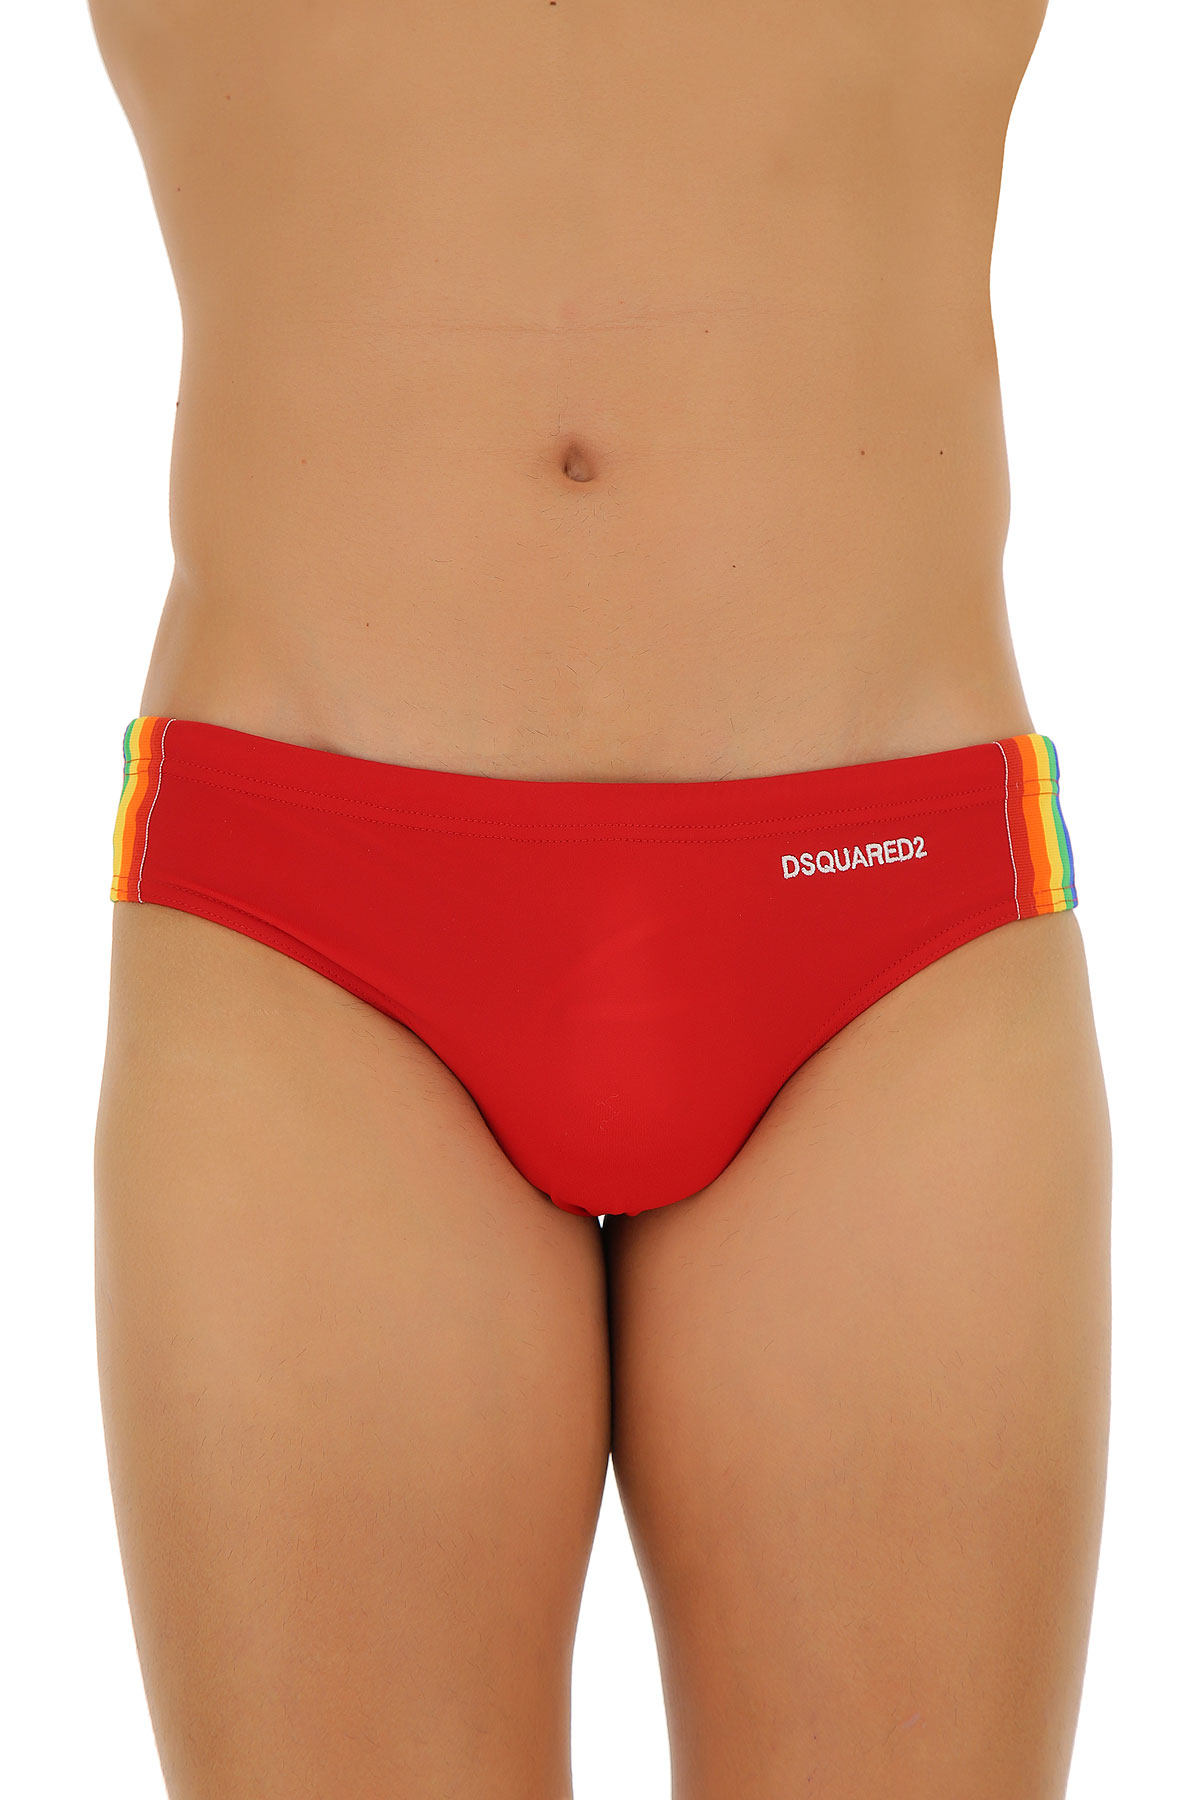 Mens Swimwear On Sale, Red, polyamide, 2017, S (EU 46) L (EU 50) XL (EU 52) Dsquared2